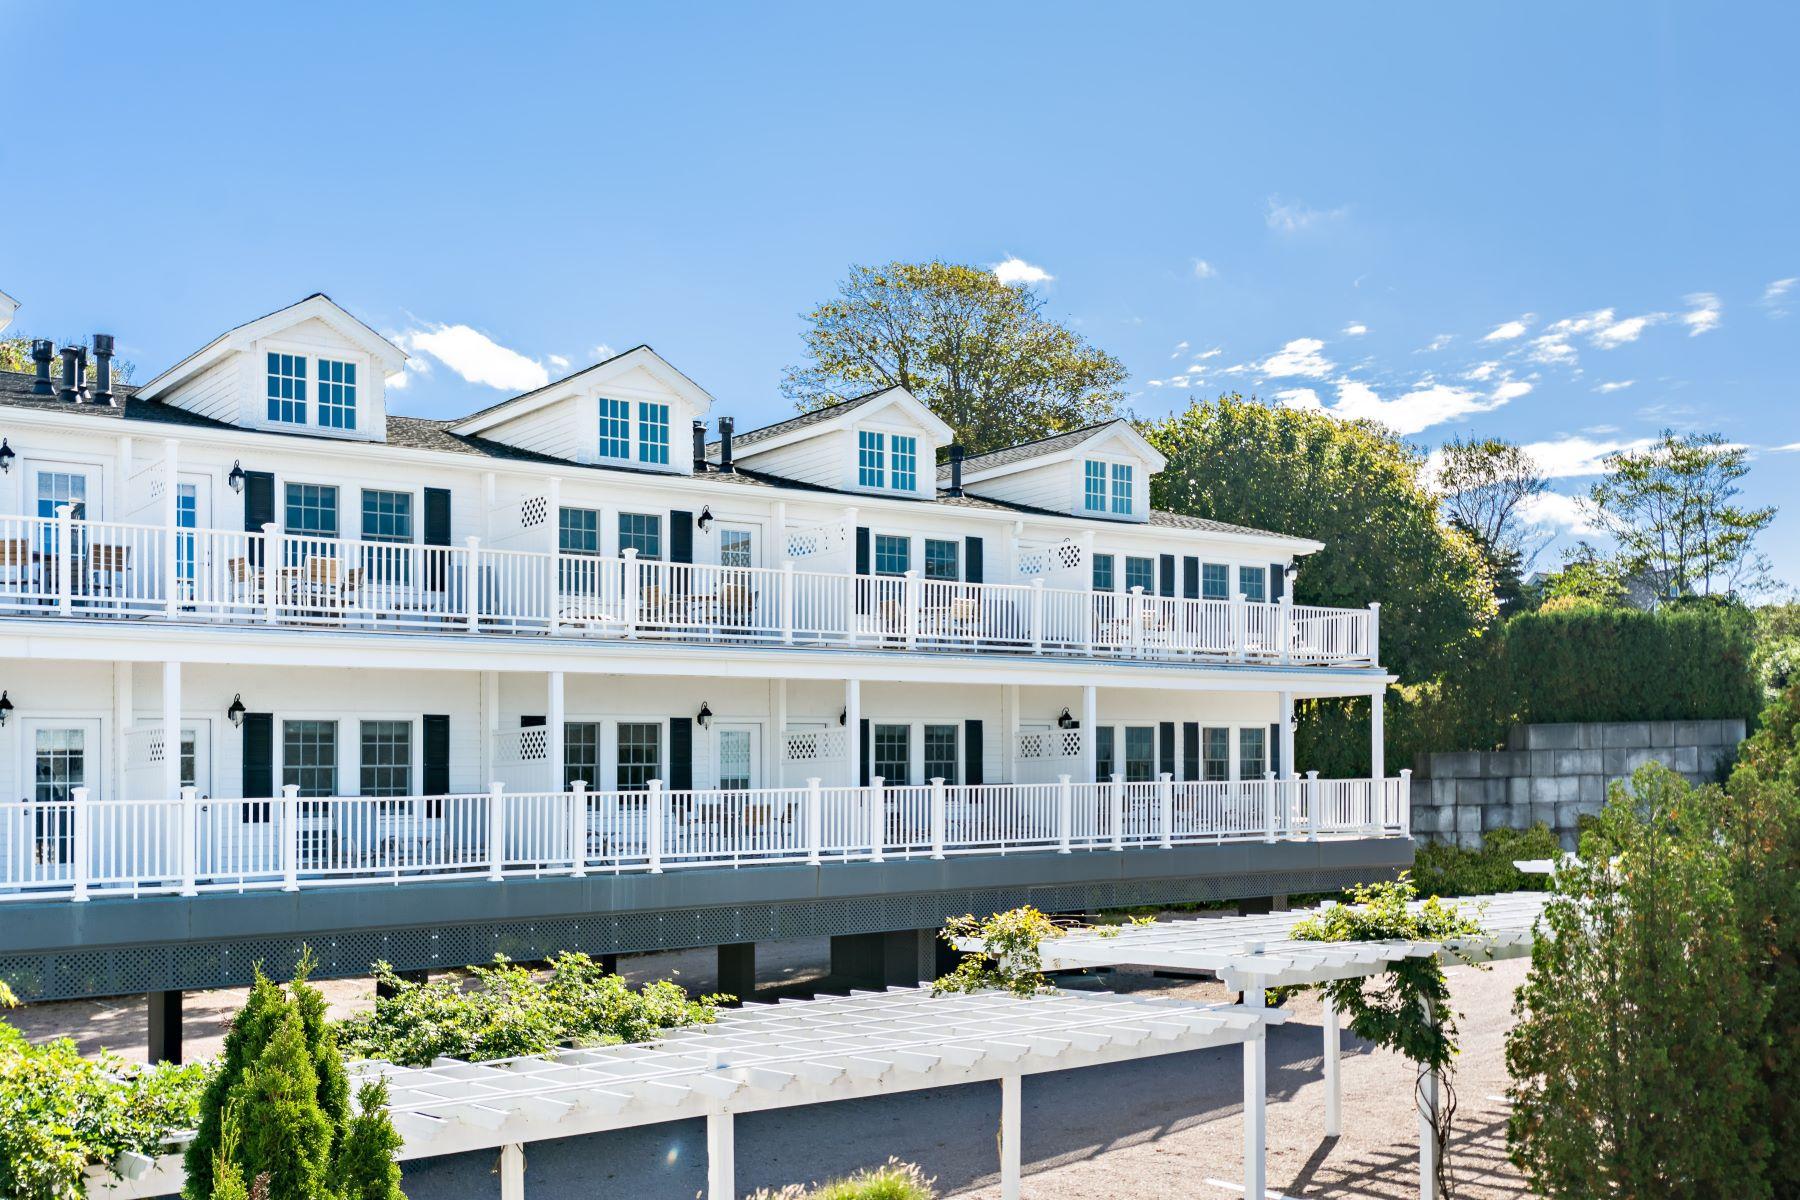 Appartement voor Verkoop op 44 Bay St, #B109/209, Westerly, RI 44 Bay St B109/209, Westerly, Rhode Island 02891 Verenigde Staten